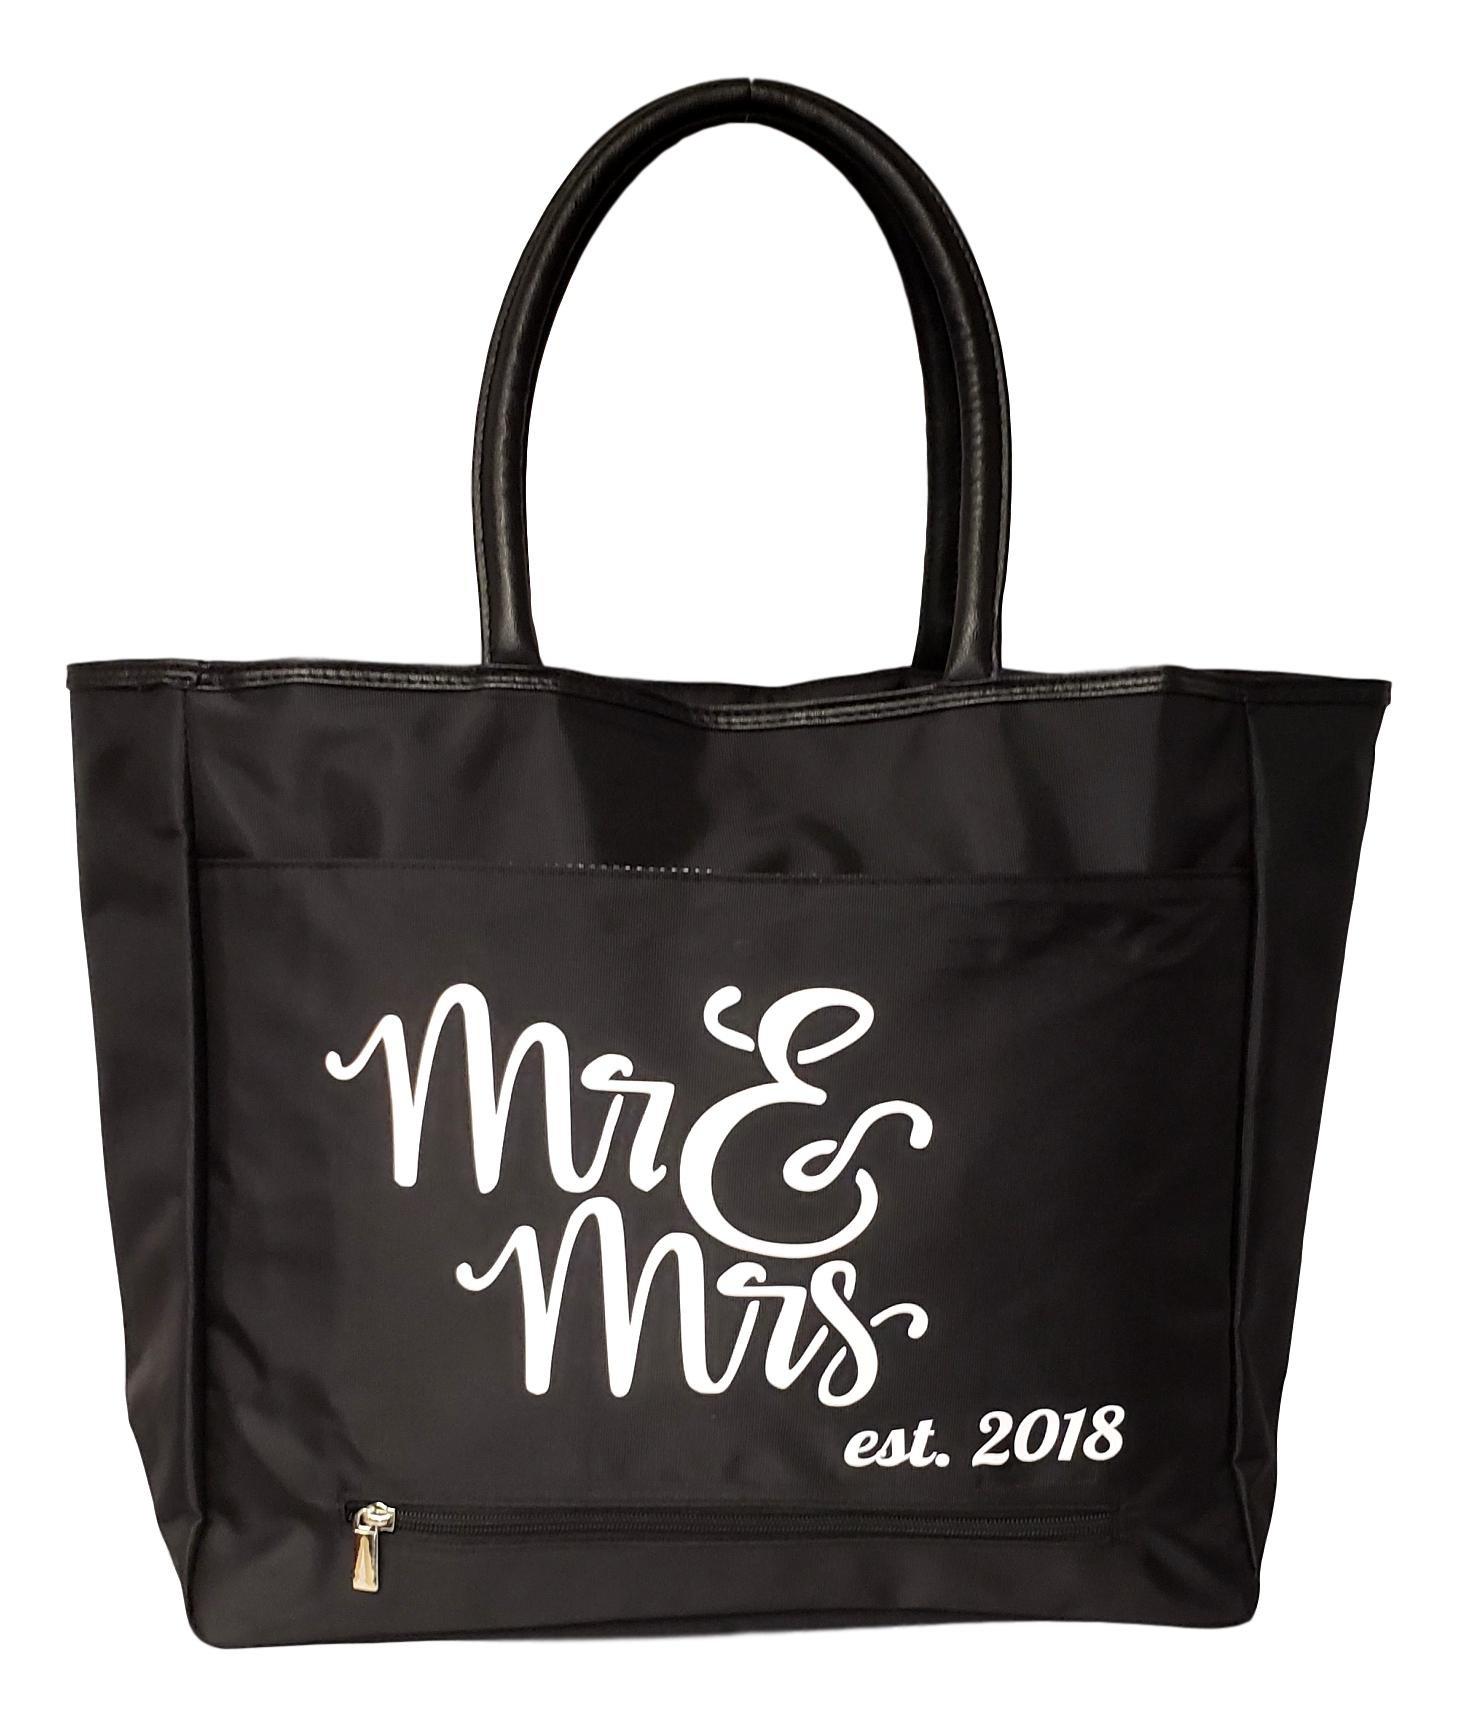 Mr & Mrs Bride Large Black Organizing Travel Companion Purse Handbag Bag (Mr & Mrs 2018)